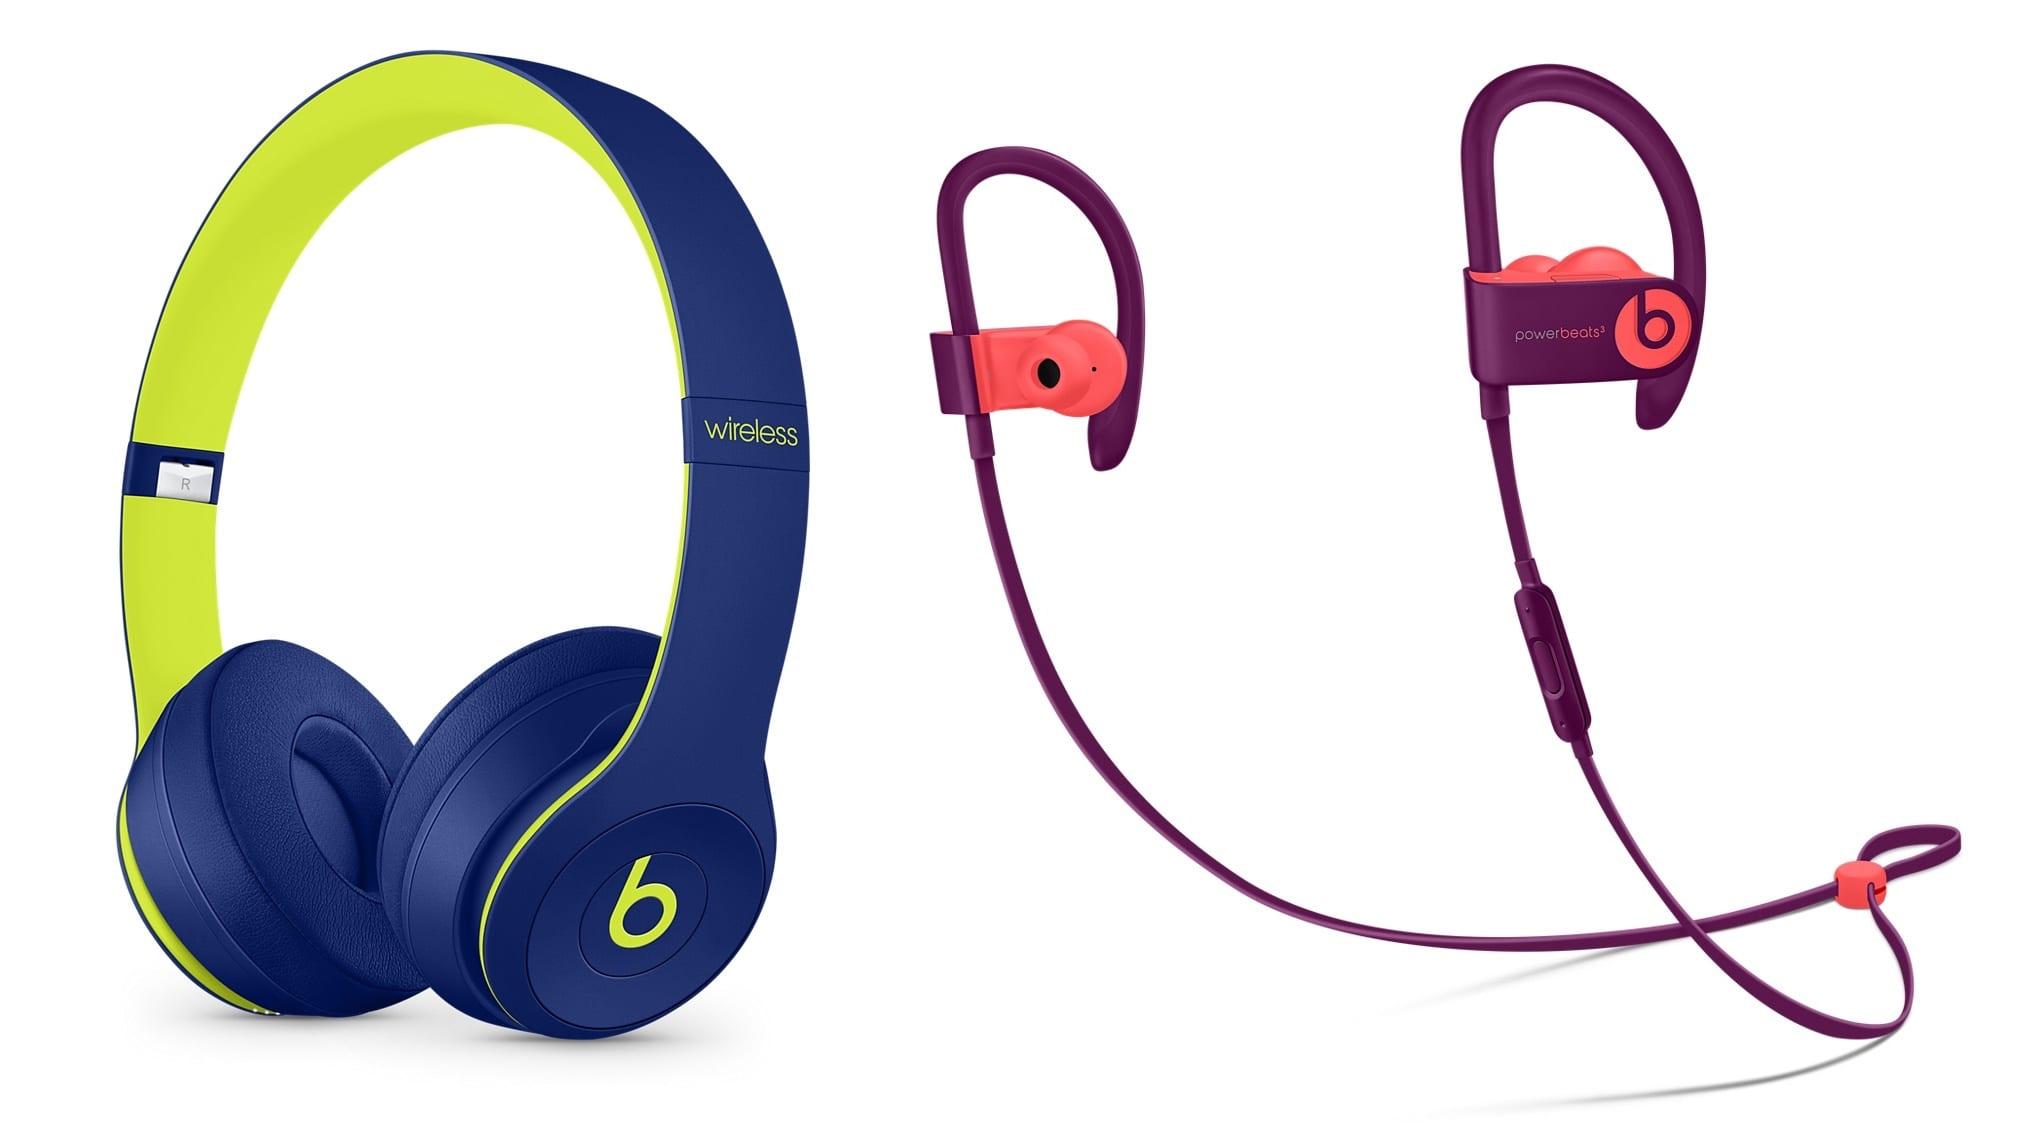 beats pop collection - Apple predstavil nové pastelové obaly a náramky, pestré farby pre Beats